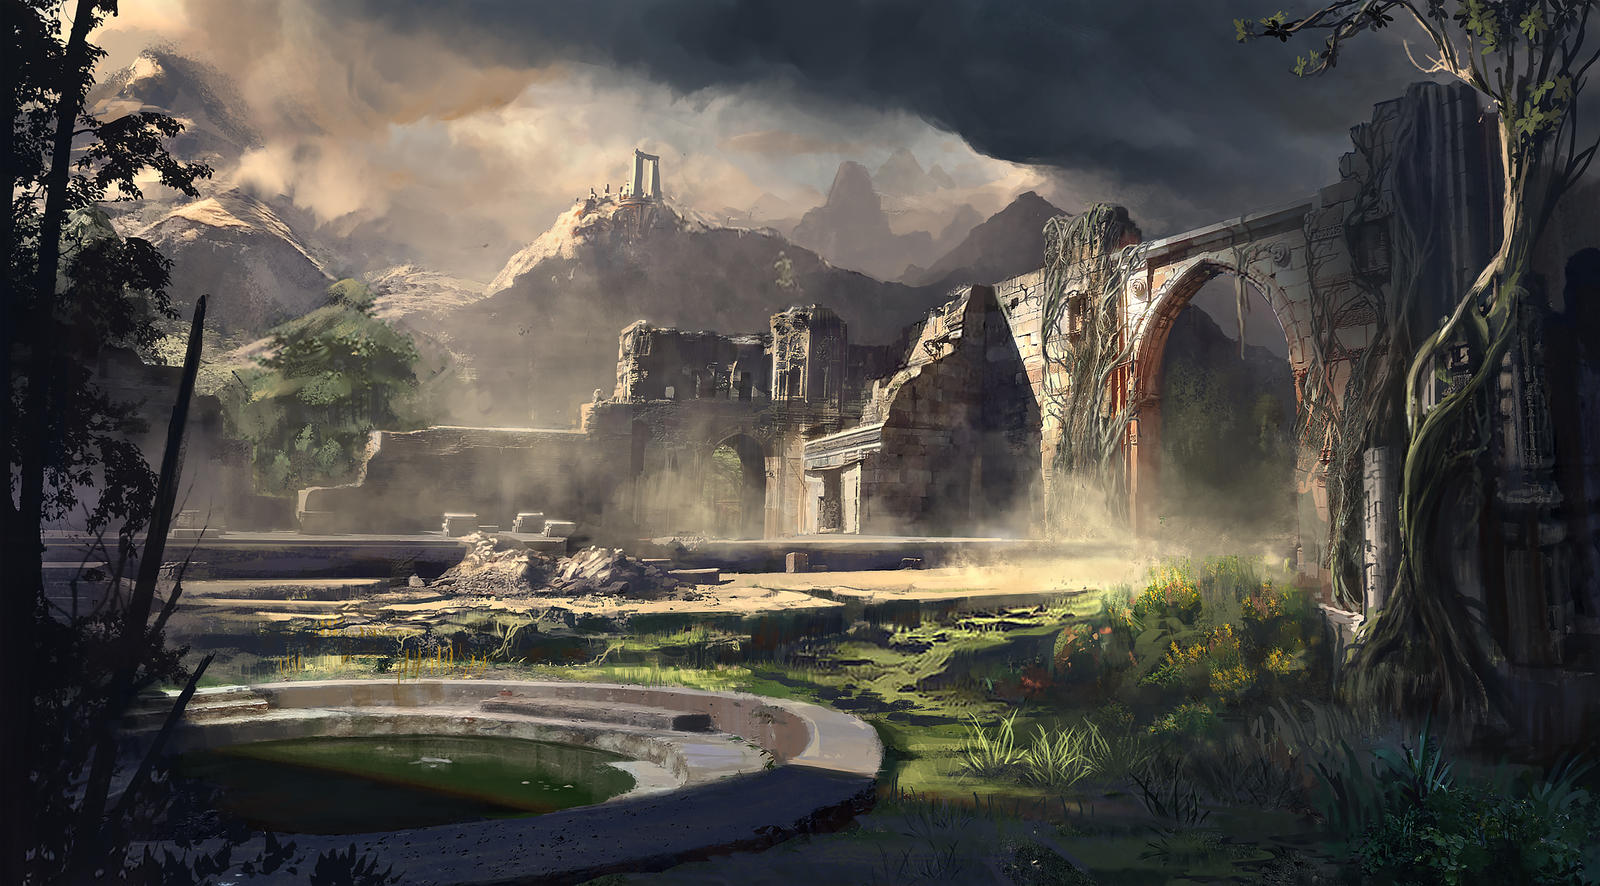 Acrospar Ruins by fmacmanus